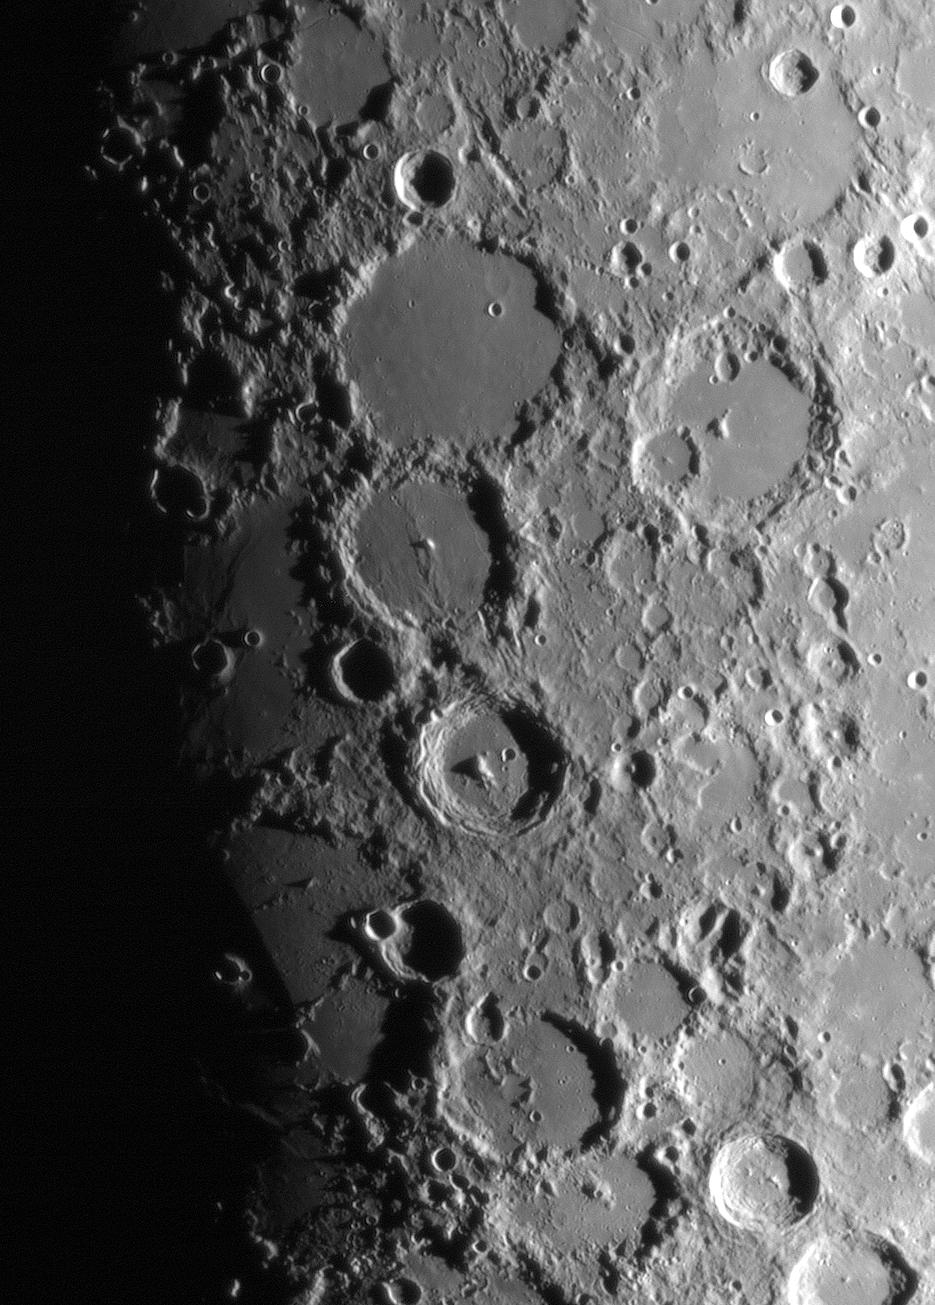 Ptolemaeus,Alphonsus,Arzachel i Rupes Recta_2_2.06.2017r_21.31_TS152F2270_ASI120M_H-alpha35nm_105%....jpg